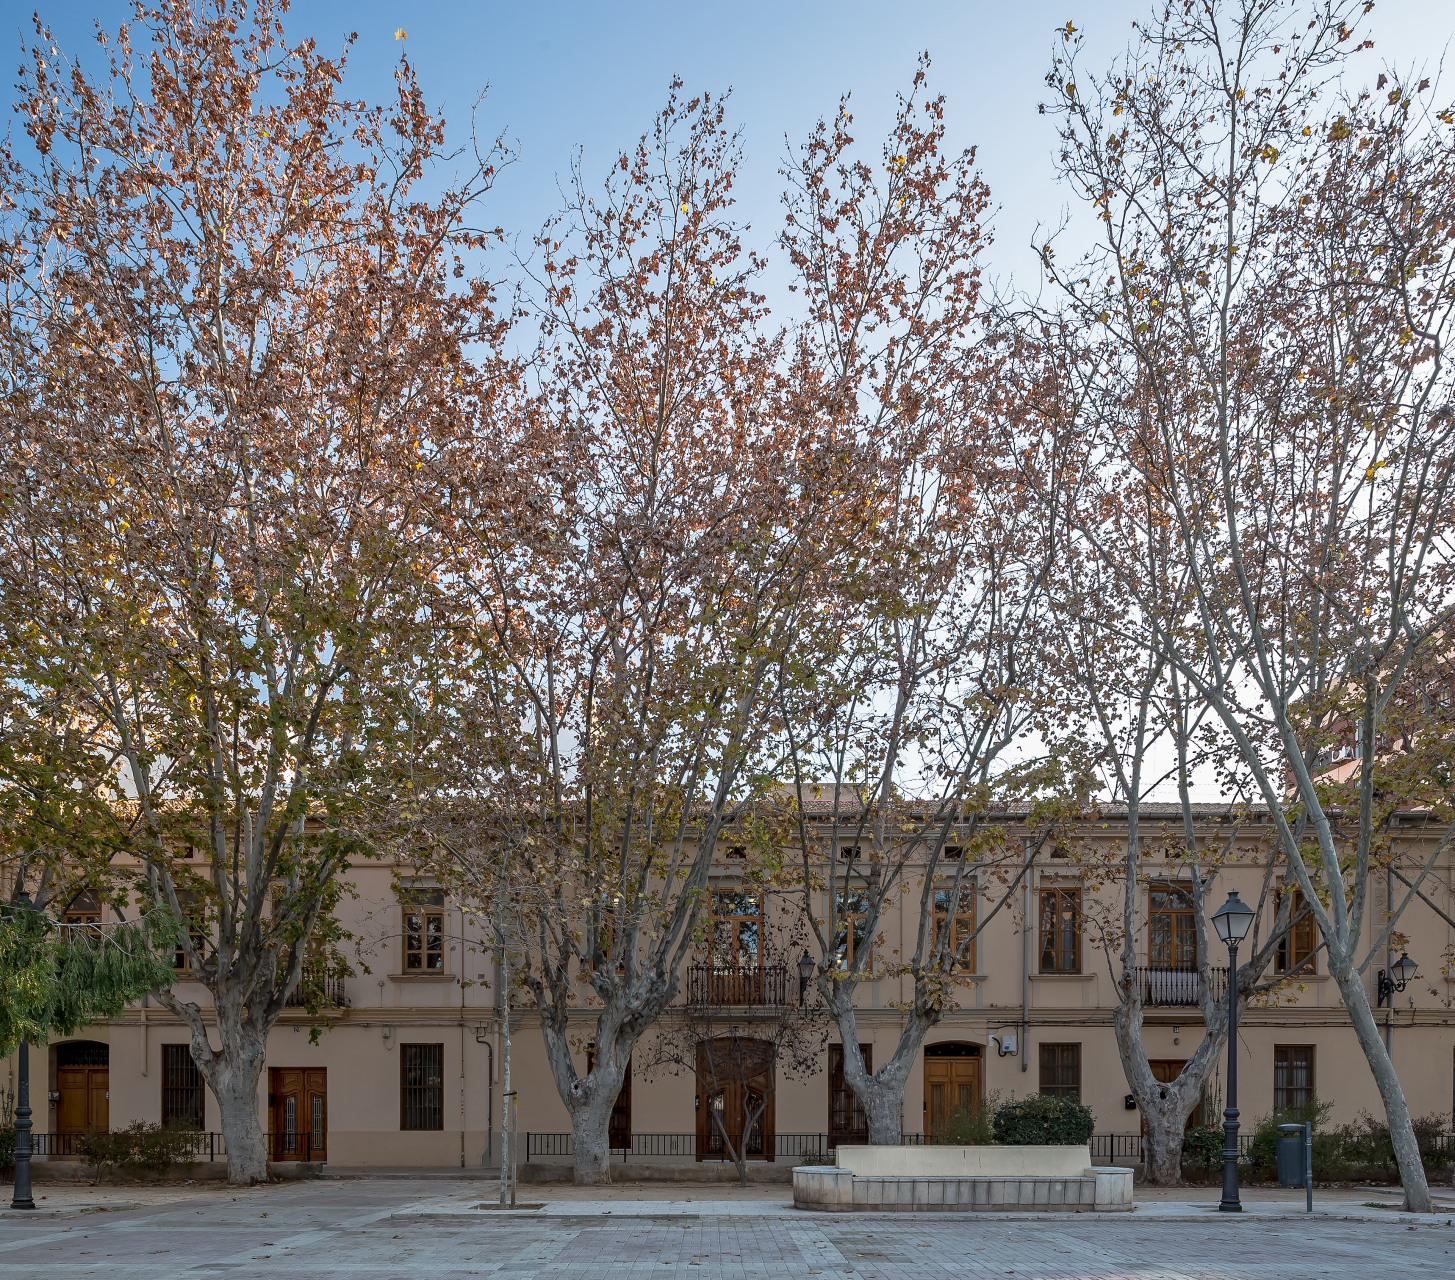 fotografia-arquitectura-valencia-german-cabo-viraje-rehabilitacion-campanar (1)